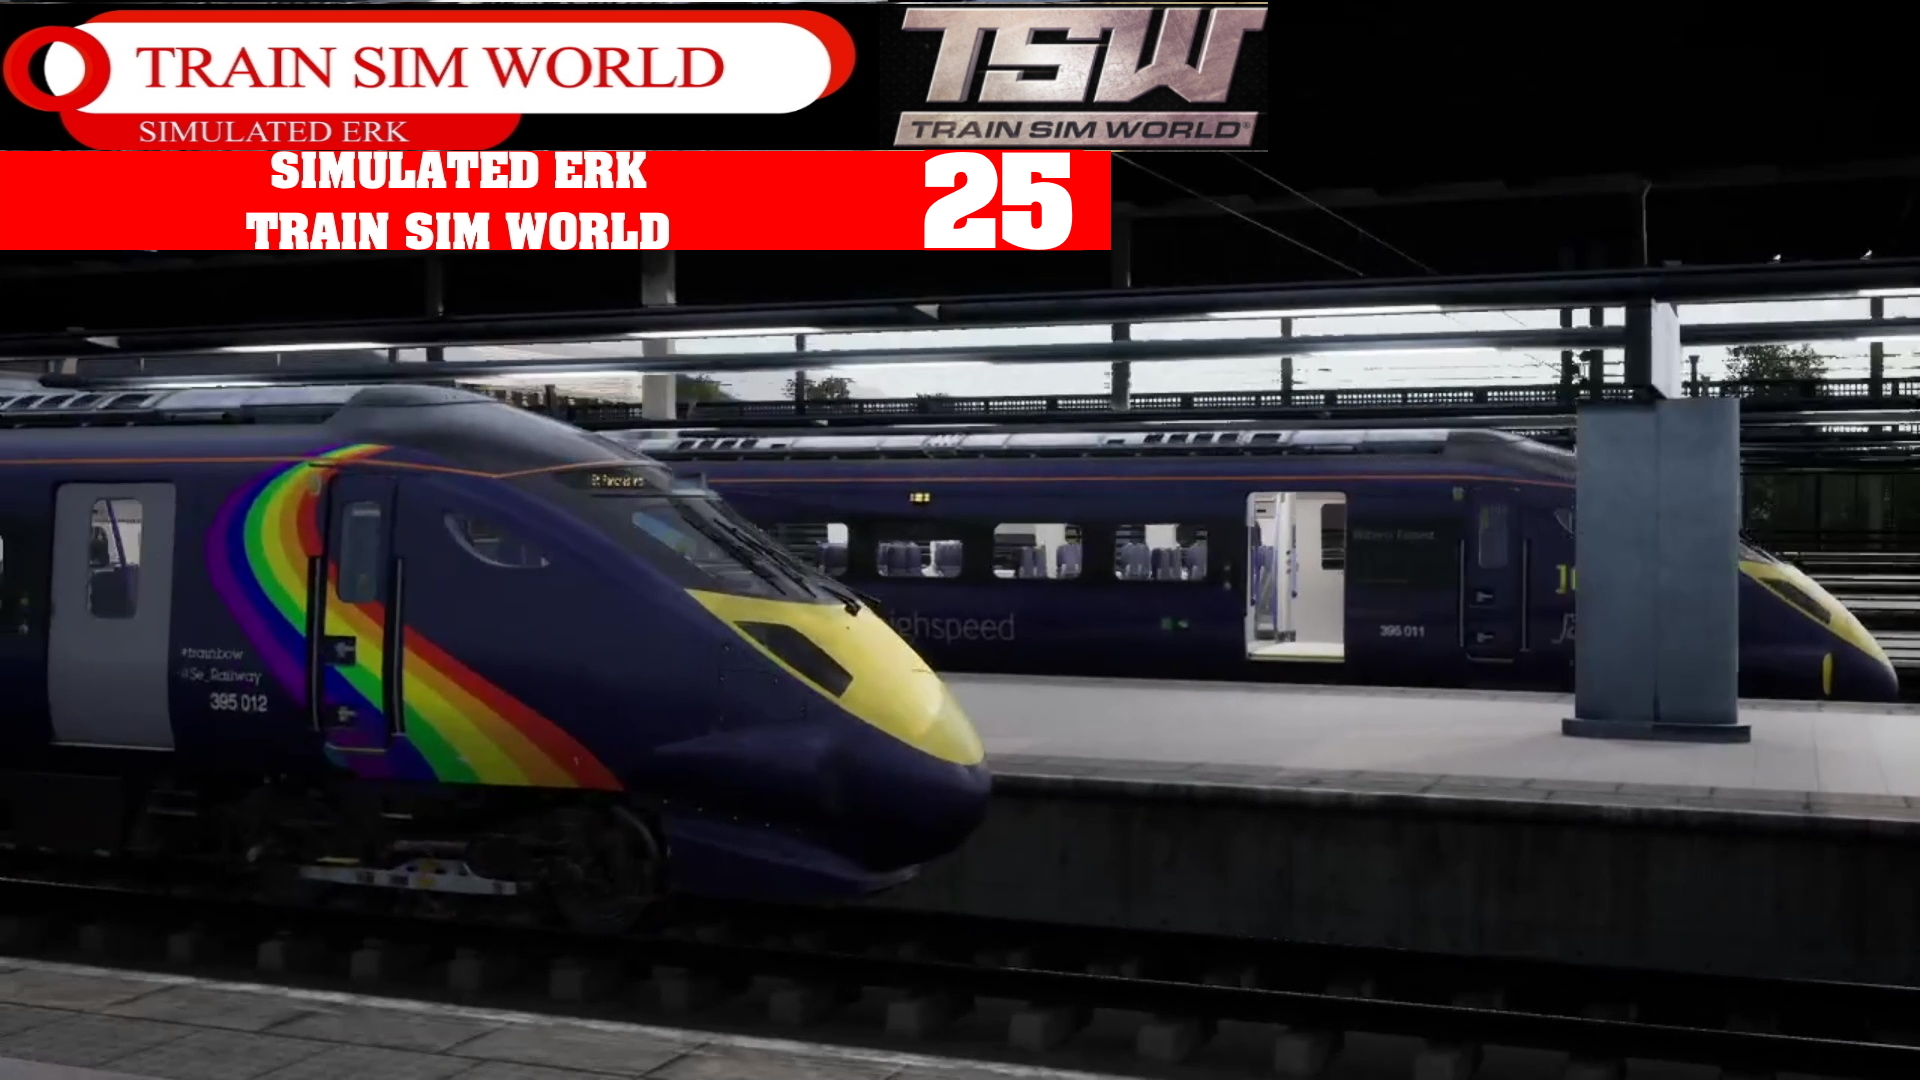 Simulated Erk: Train Sim World episode 25 | Learning The Javelin